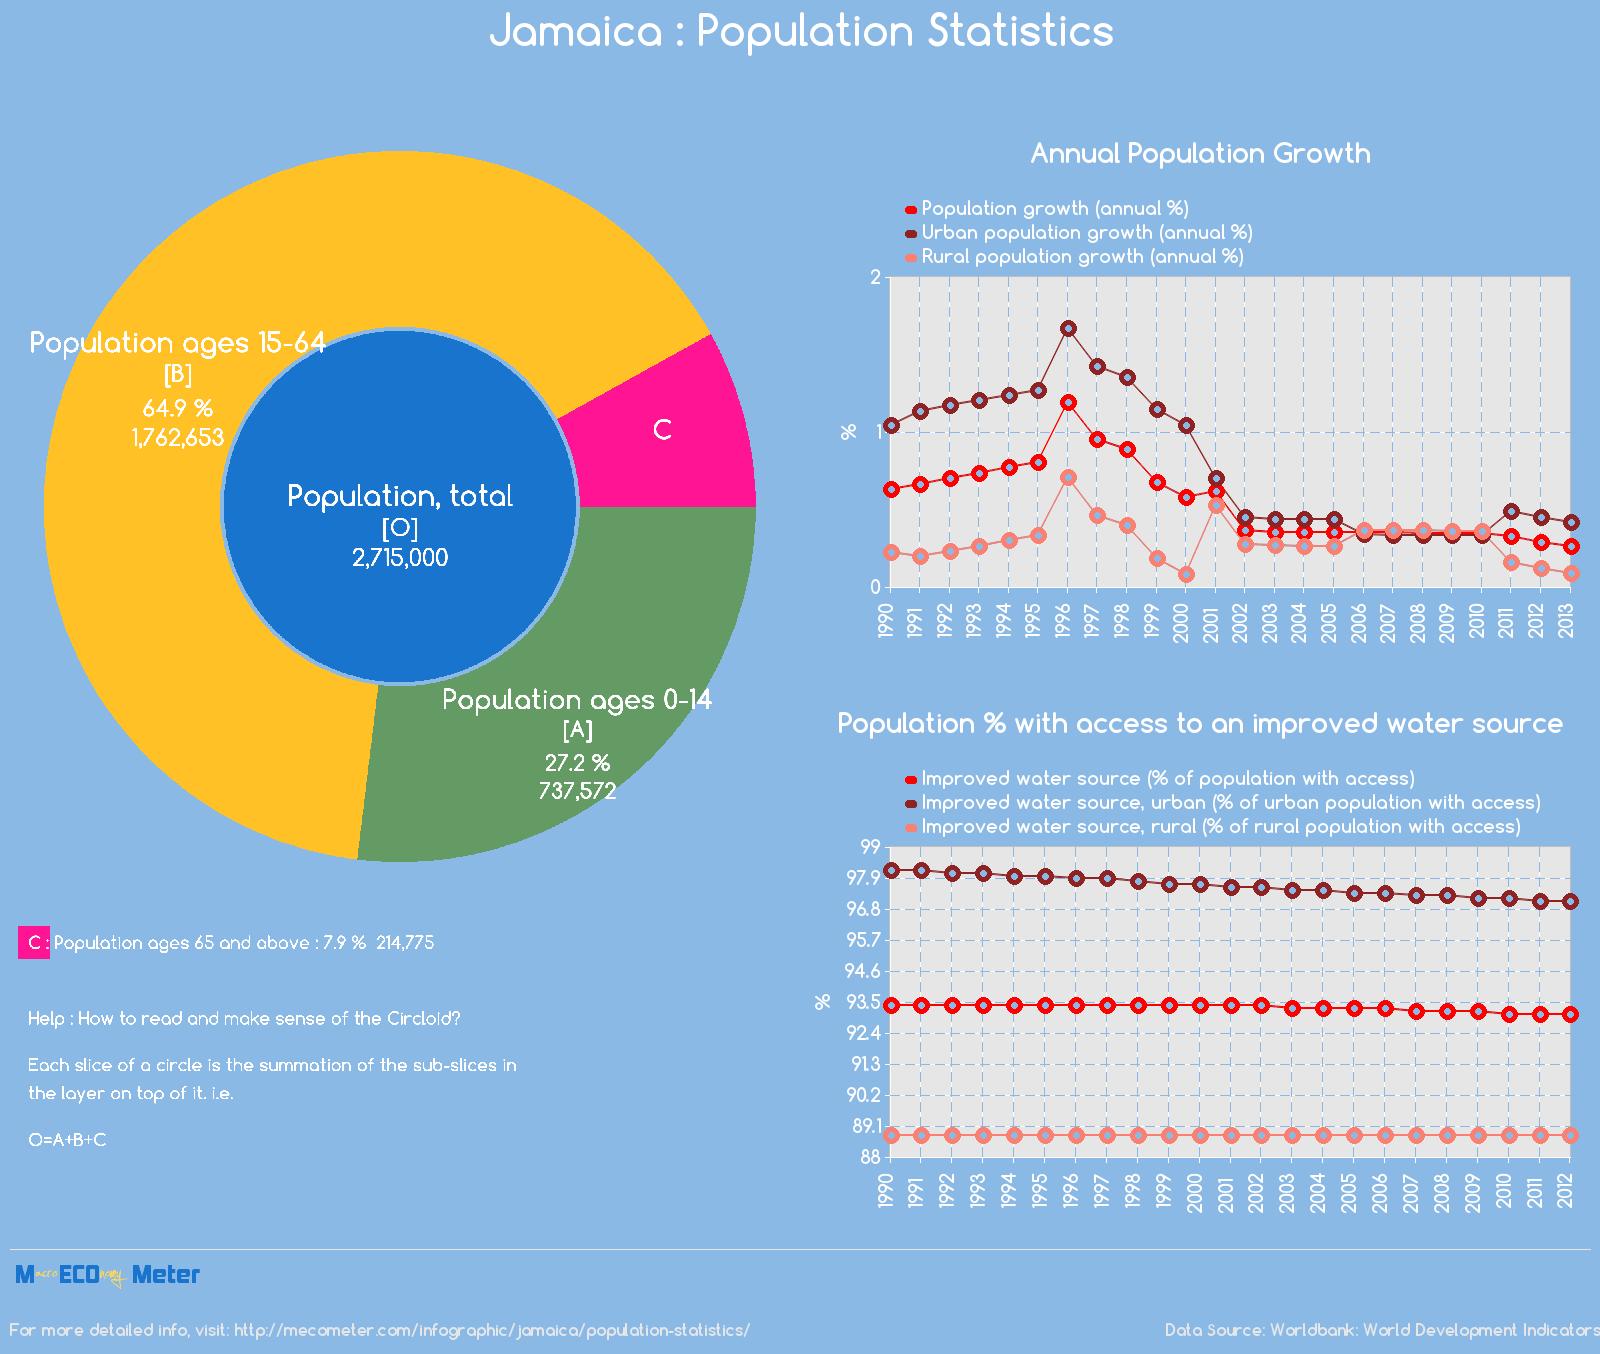 Jamaica : Population Statistics